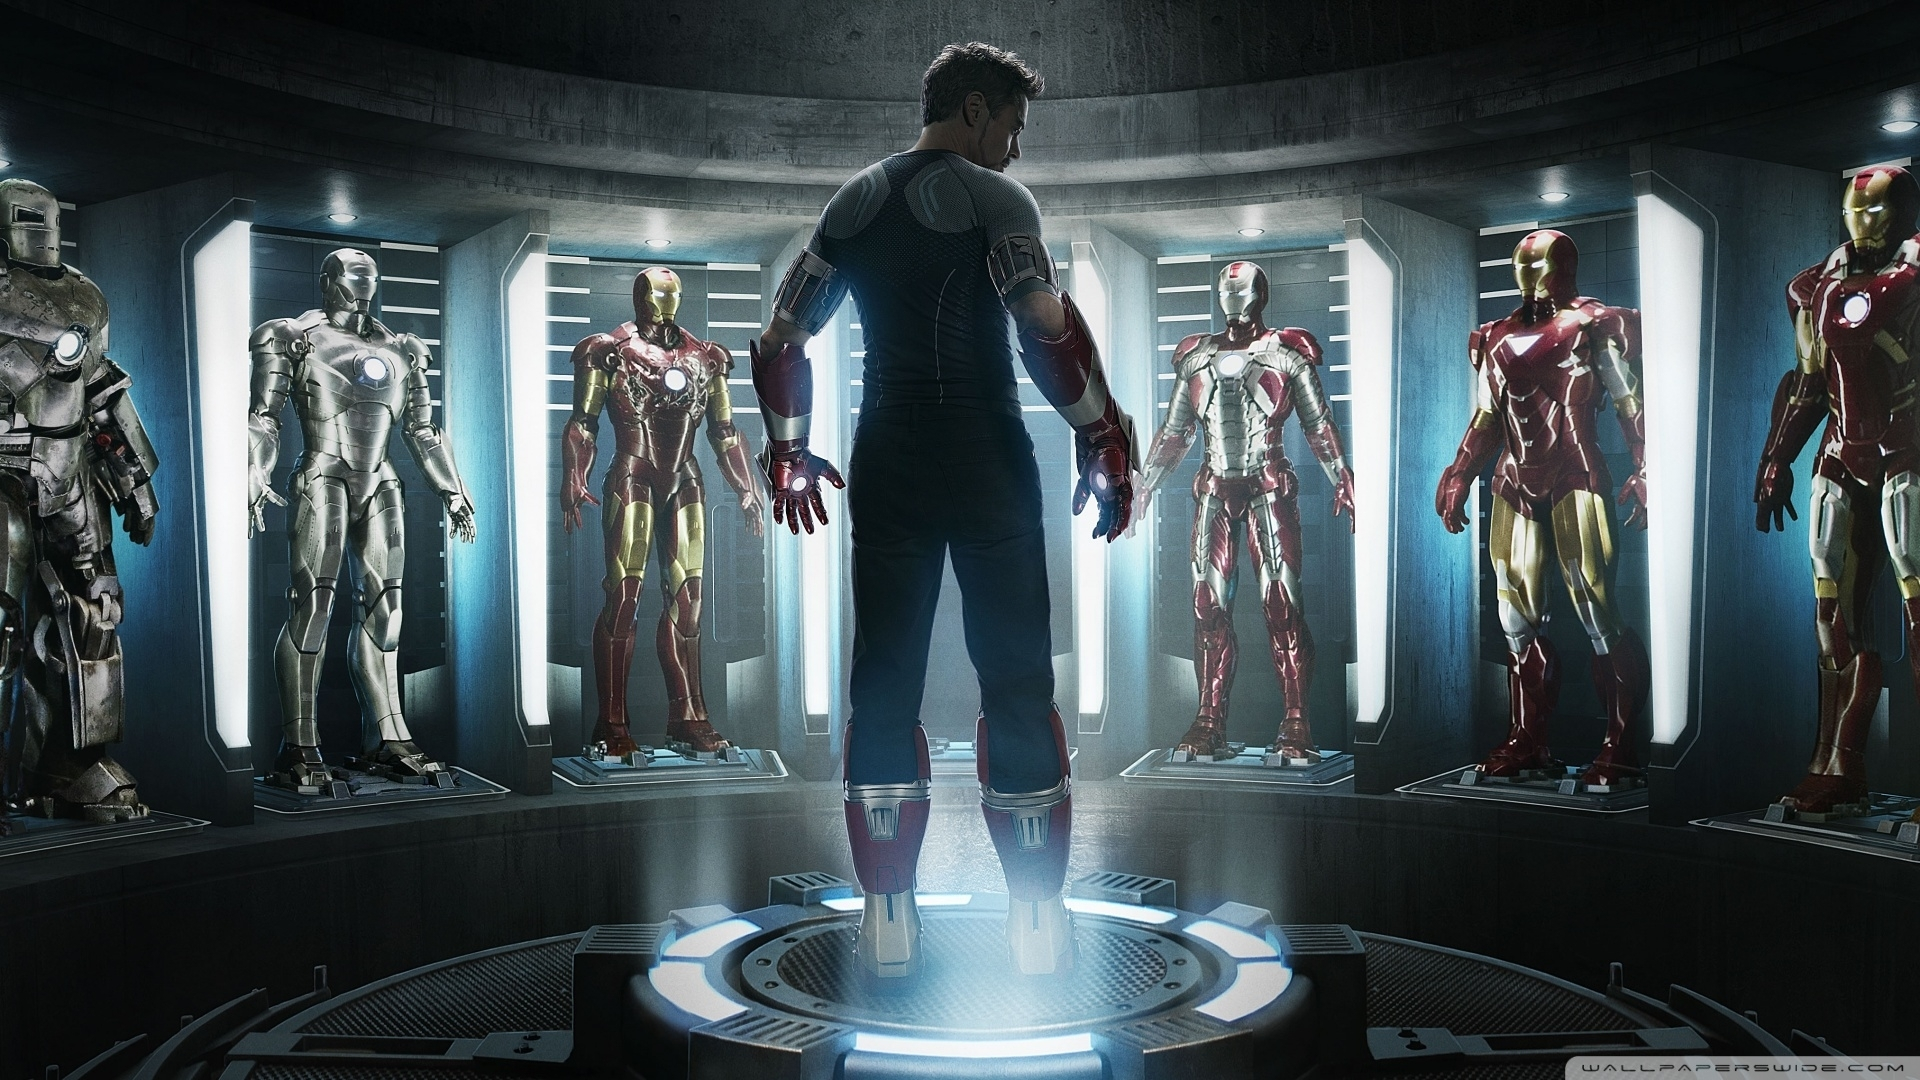 iron man 3 2013 movie ❤ 4k hd desktop wallpaper for 4k ultra hd tv